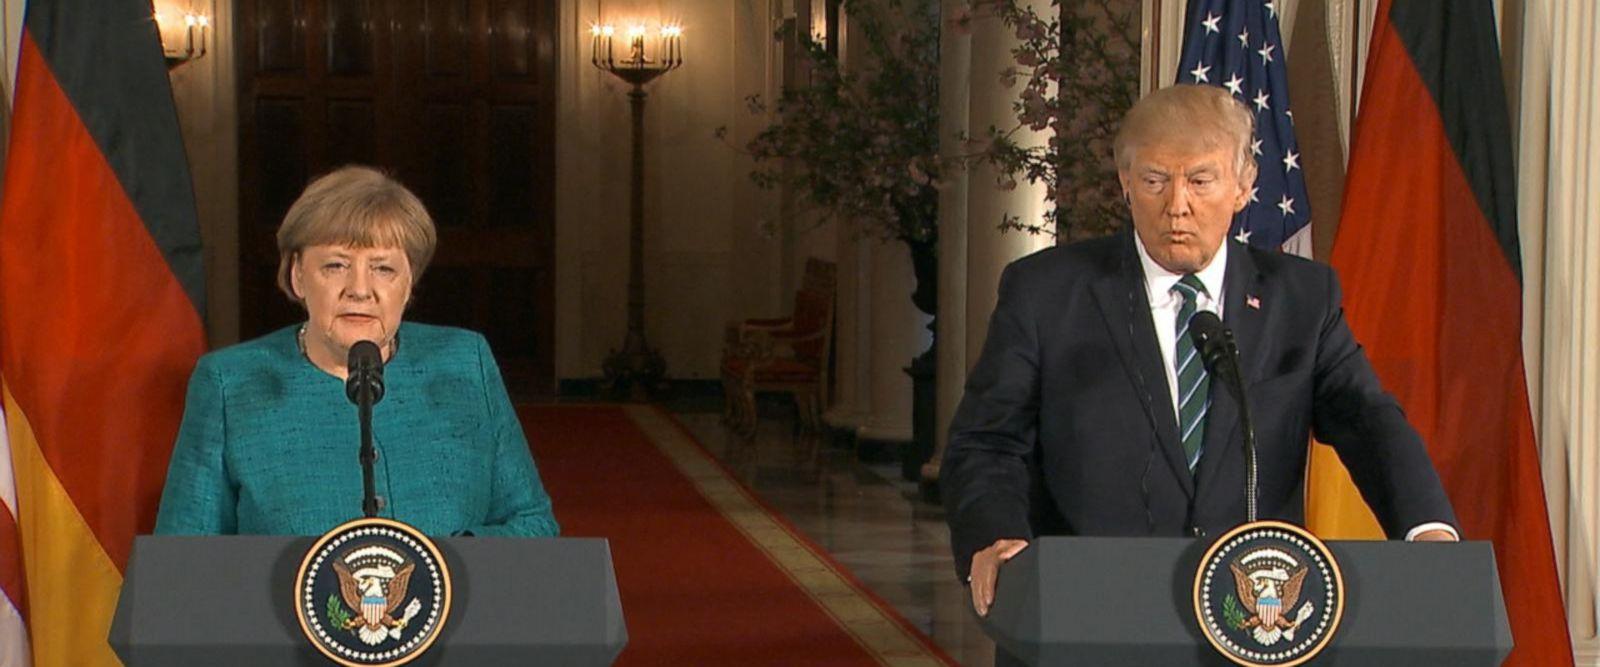 VIDEO: President Trump hosts German Chancellor Angela Merkel